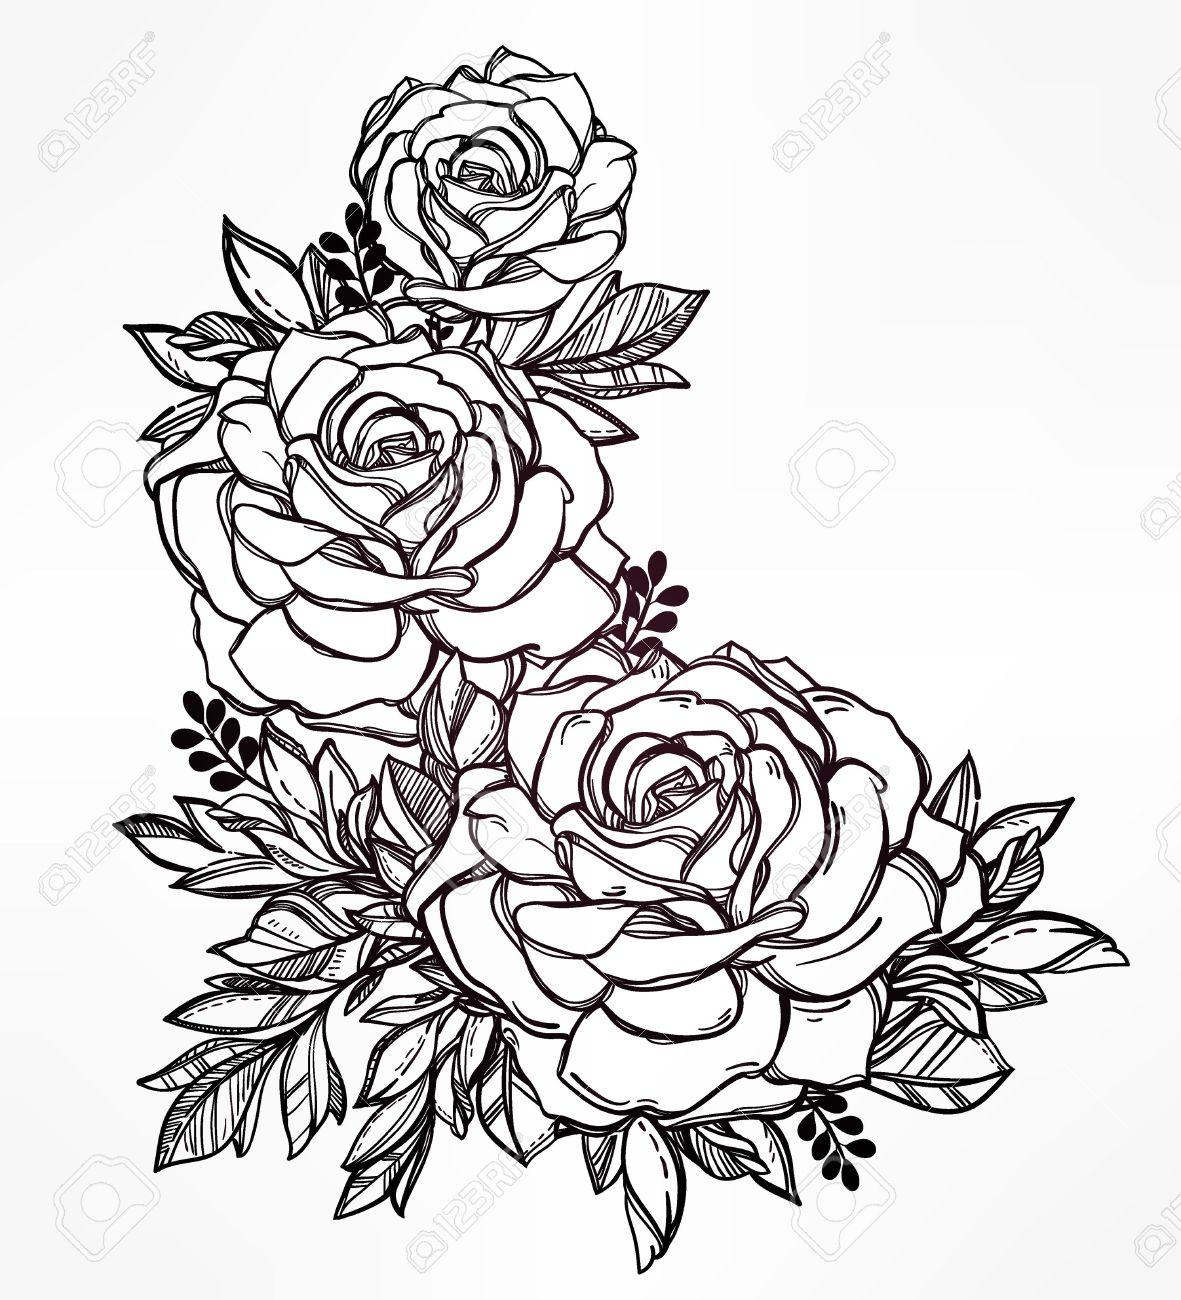 Modele Tatouage Rose Modele Tatouage Rose With Modele Tatouage Rose